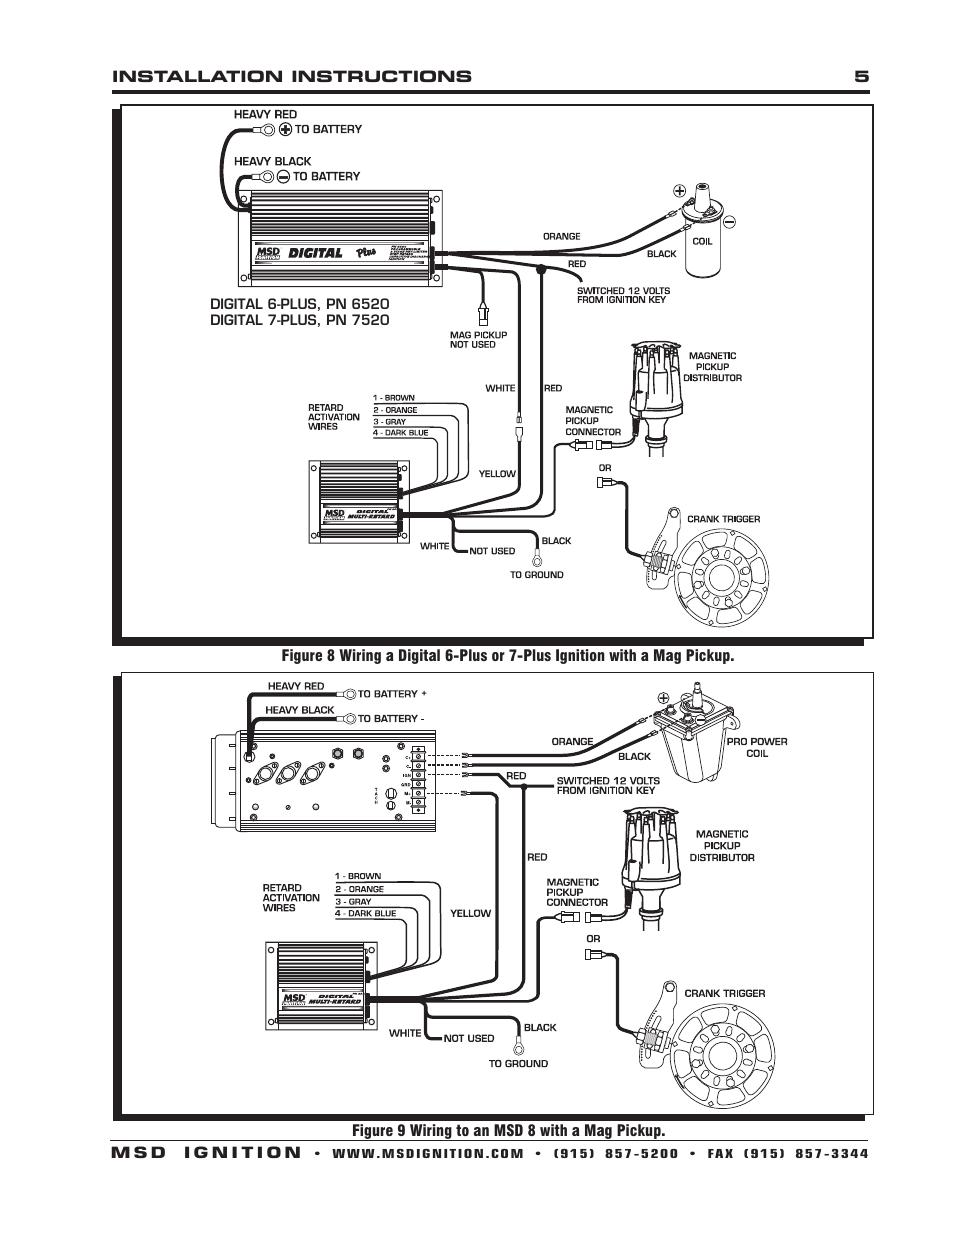 msd wiring diagram msd 8975 digital multi retard installation user manual page 5 8 msd wiring diagrams and technotes msd 8975 digital multi retard